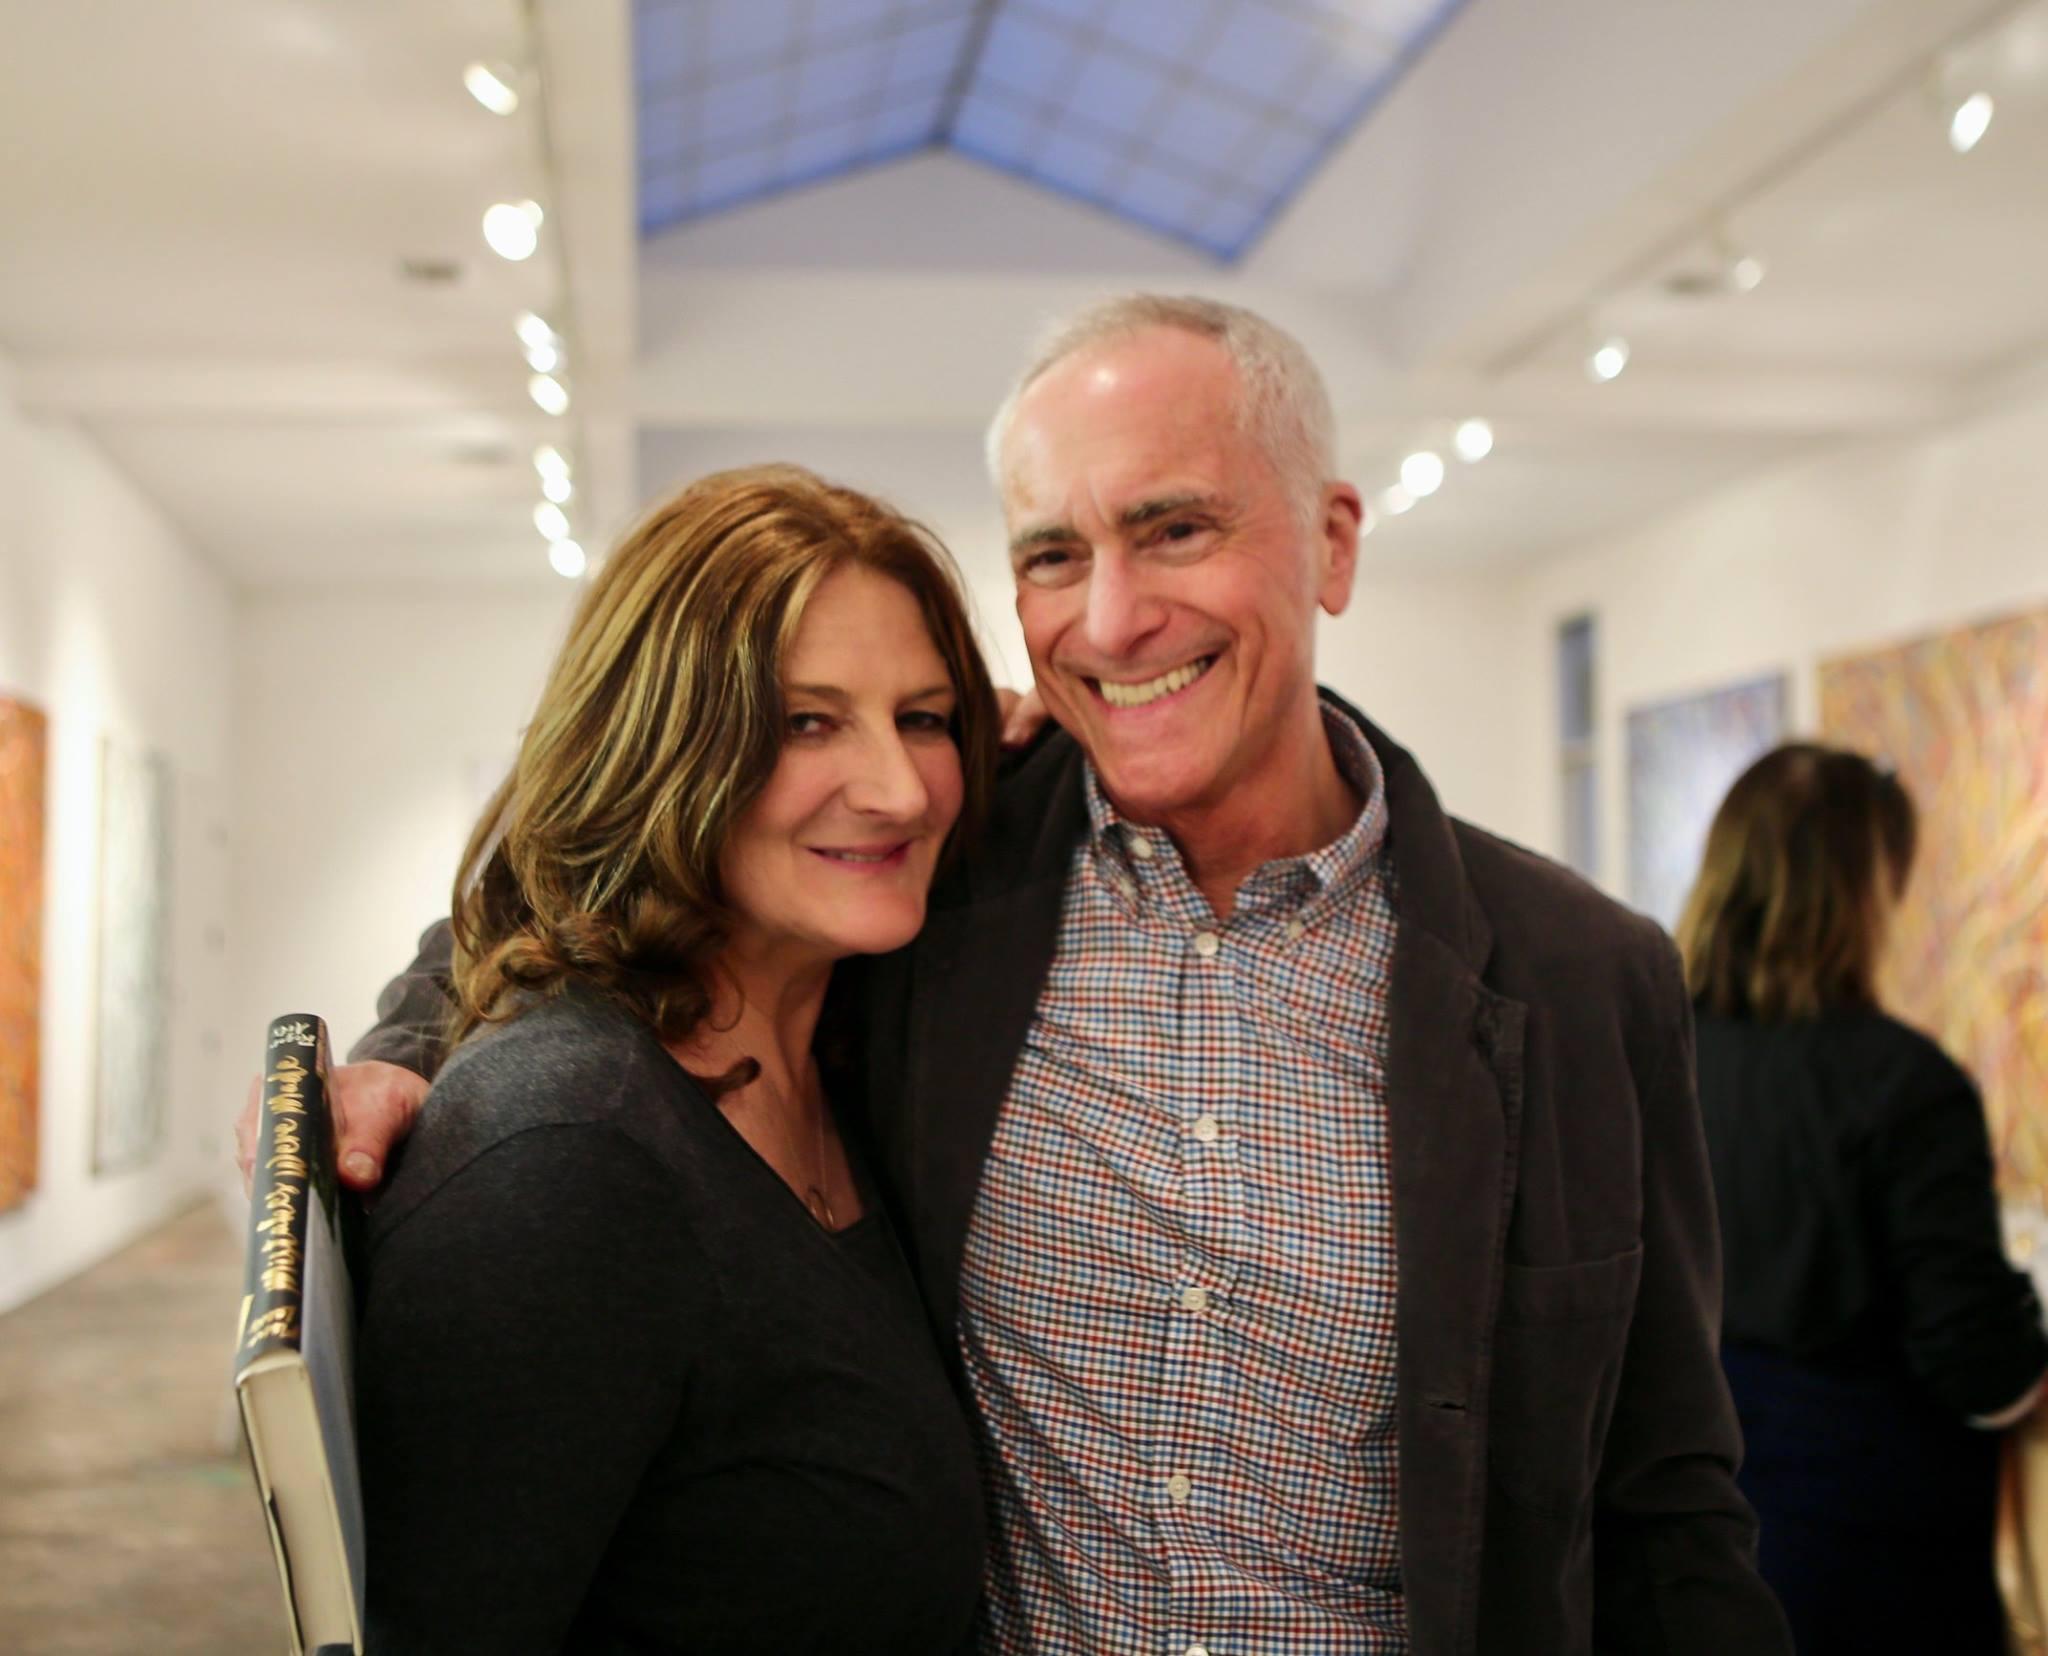 Kathryn Ireland and writer A Scott Berg